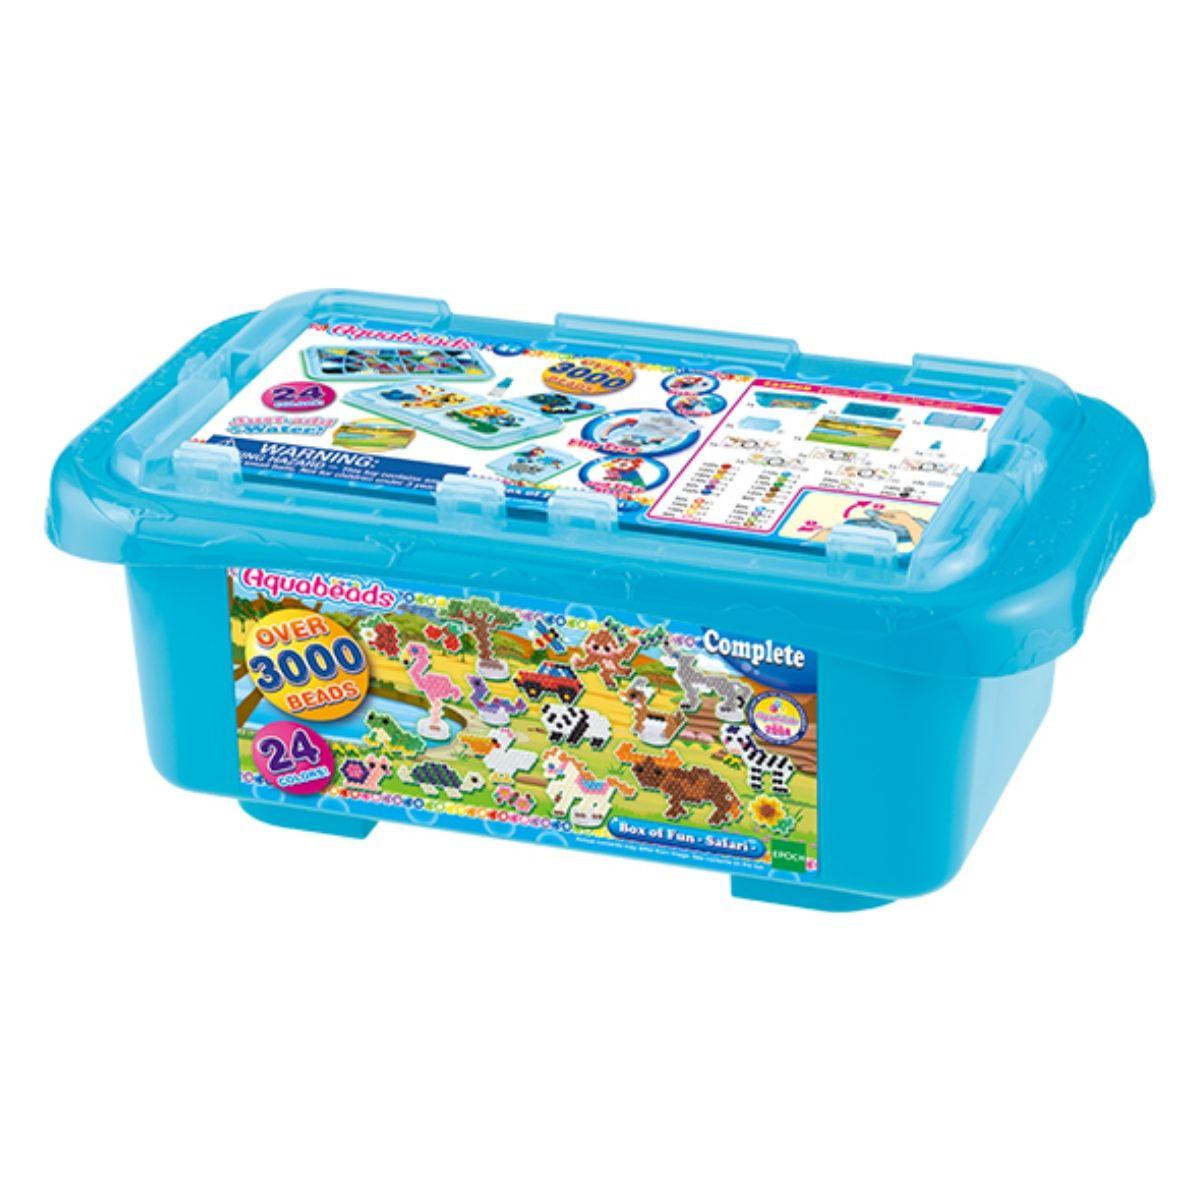 Brinquedo Aquabeads Caixa Box Of Fun Safari Epoch 32808  - Game Land Brinquedos